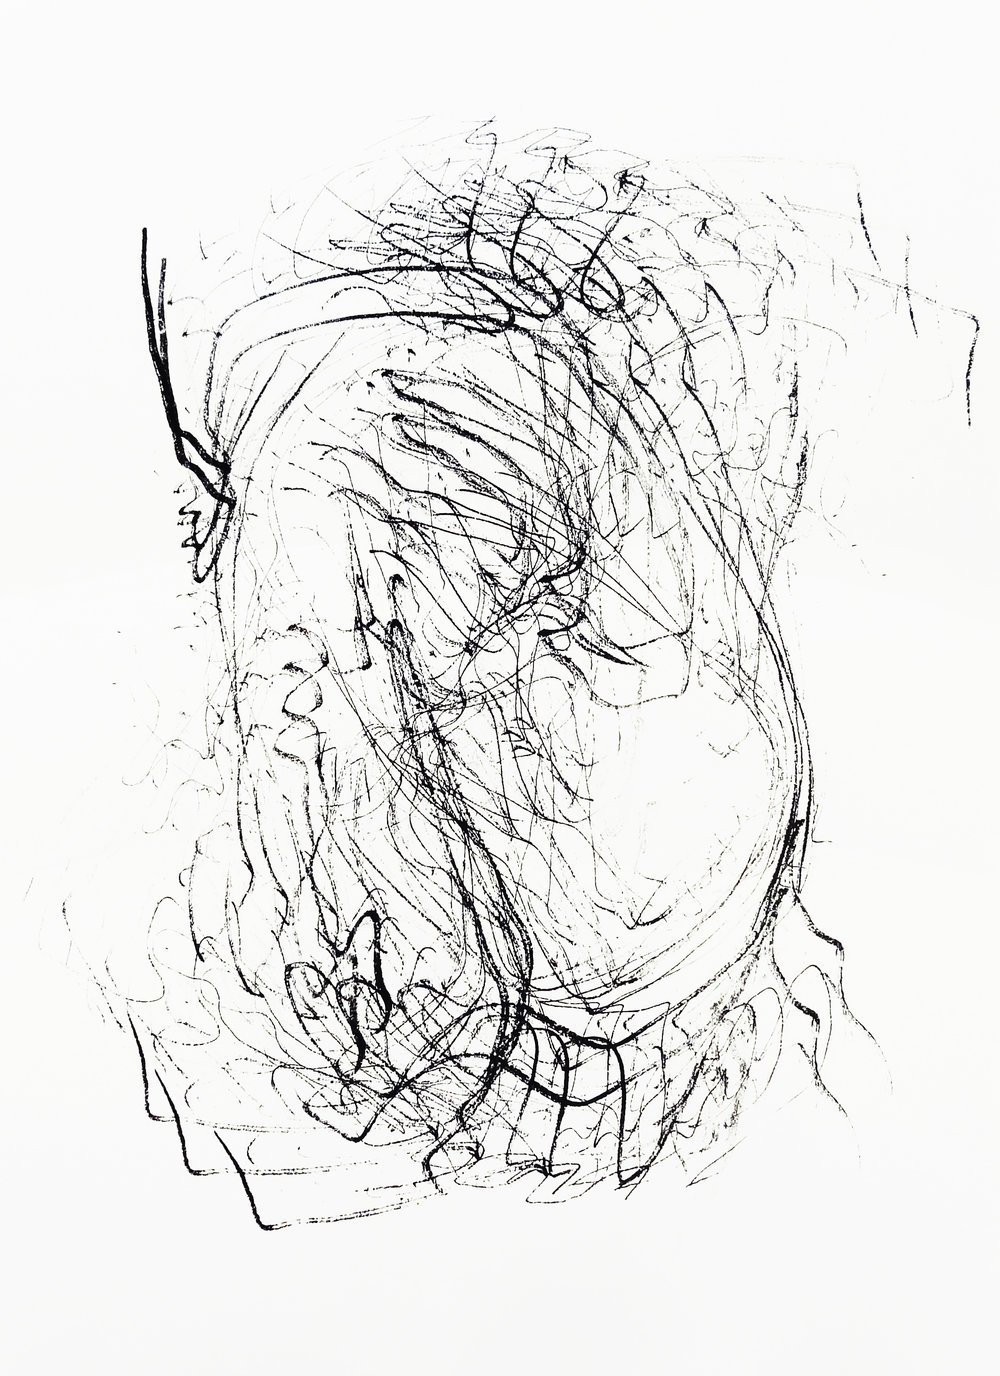 Untitled, 2015 acrylic on paper one-off screenprint 42,0 x 29,7 cm (7-15)